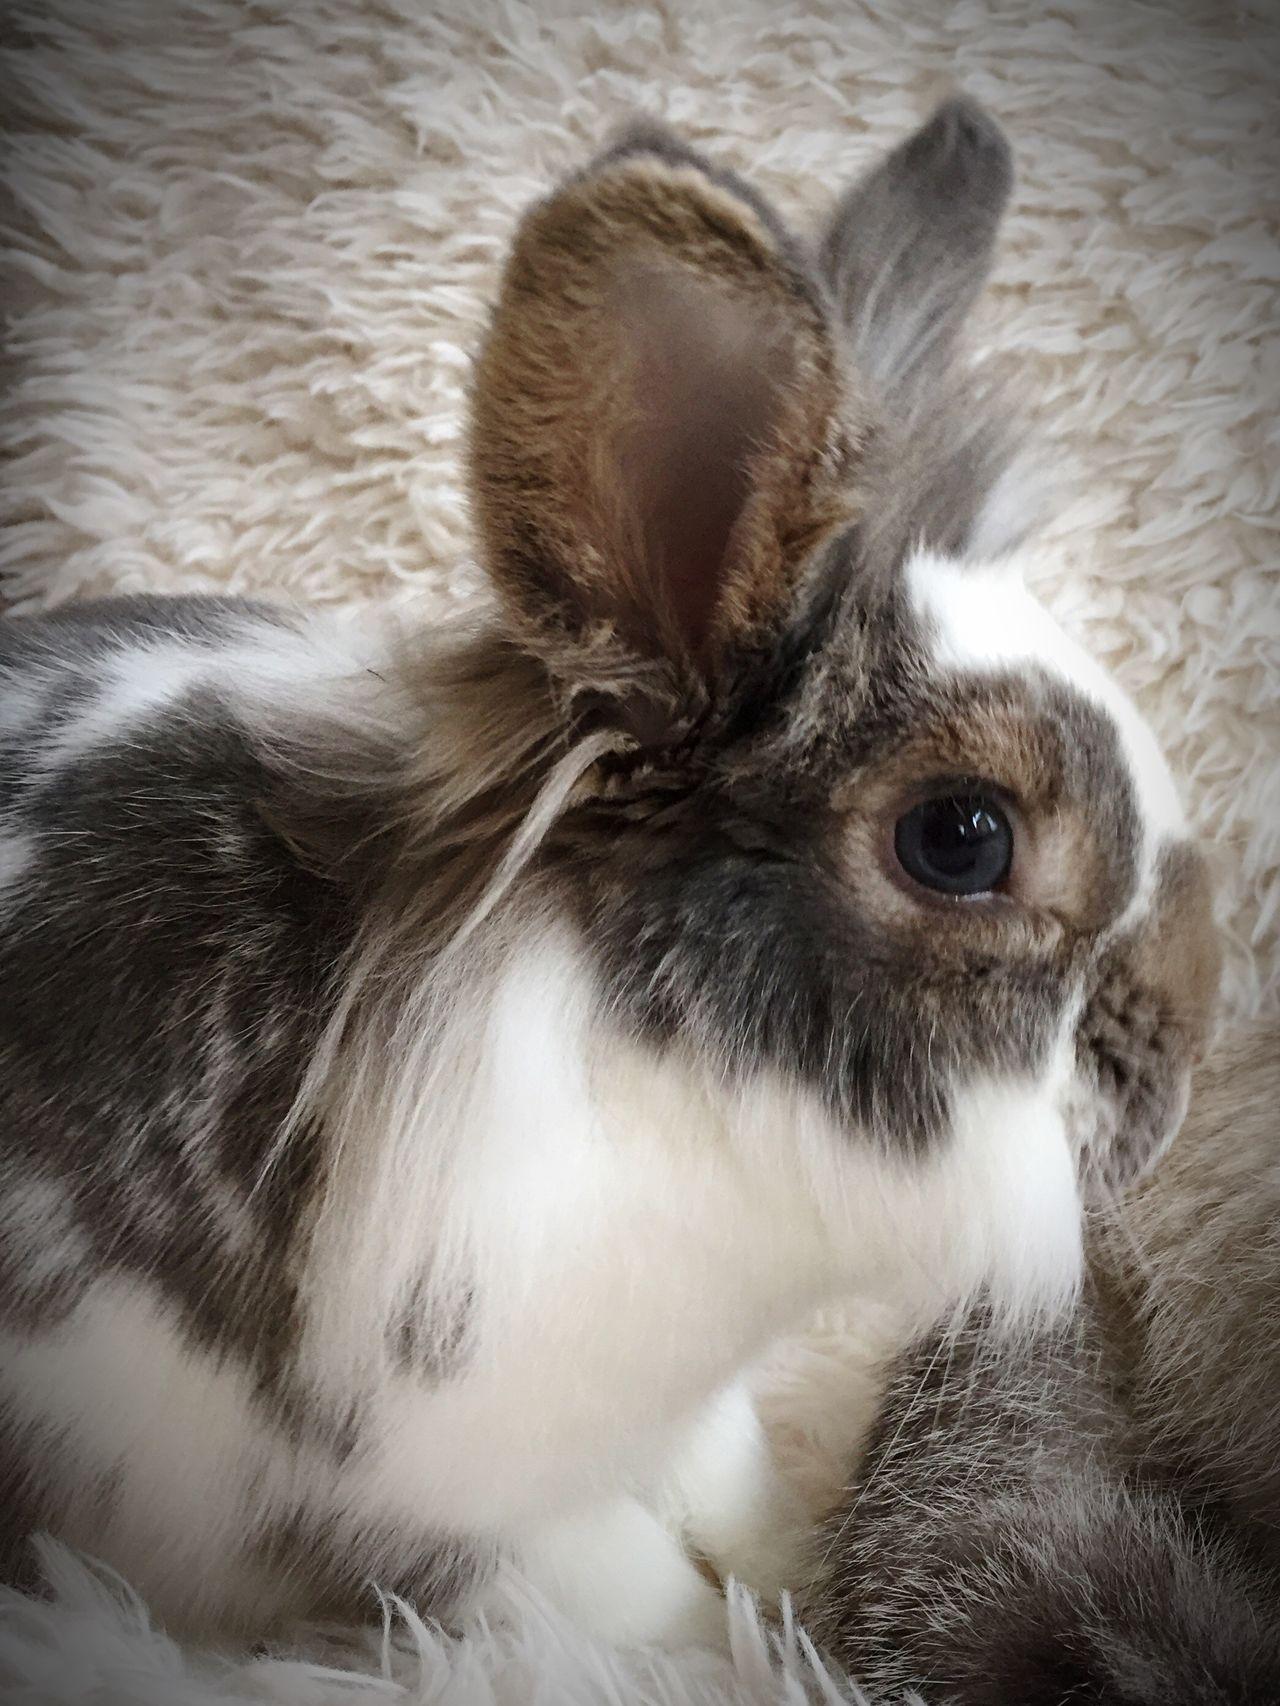 Domestic Animals Indoors  One Animal No People Rabbits Rabbit♡ Pets Cats Of EyeEm Cats Rabbit ❤️ Rabbit 🐇 EyeEm Animal Lover